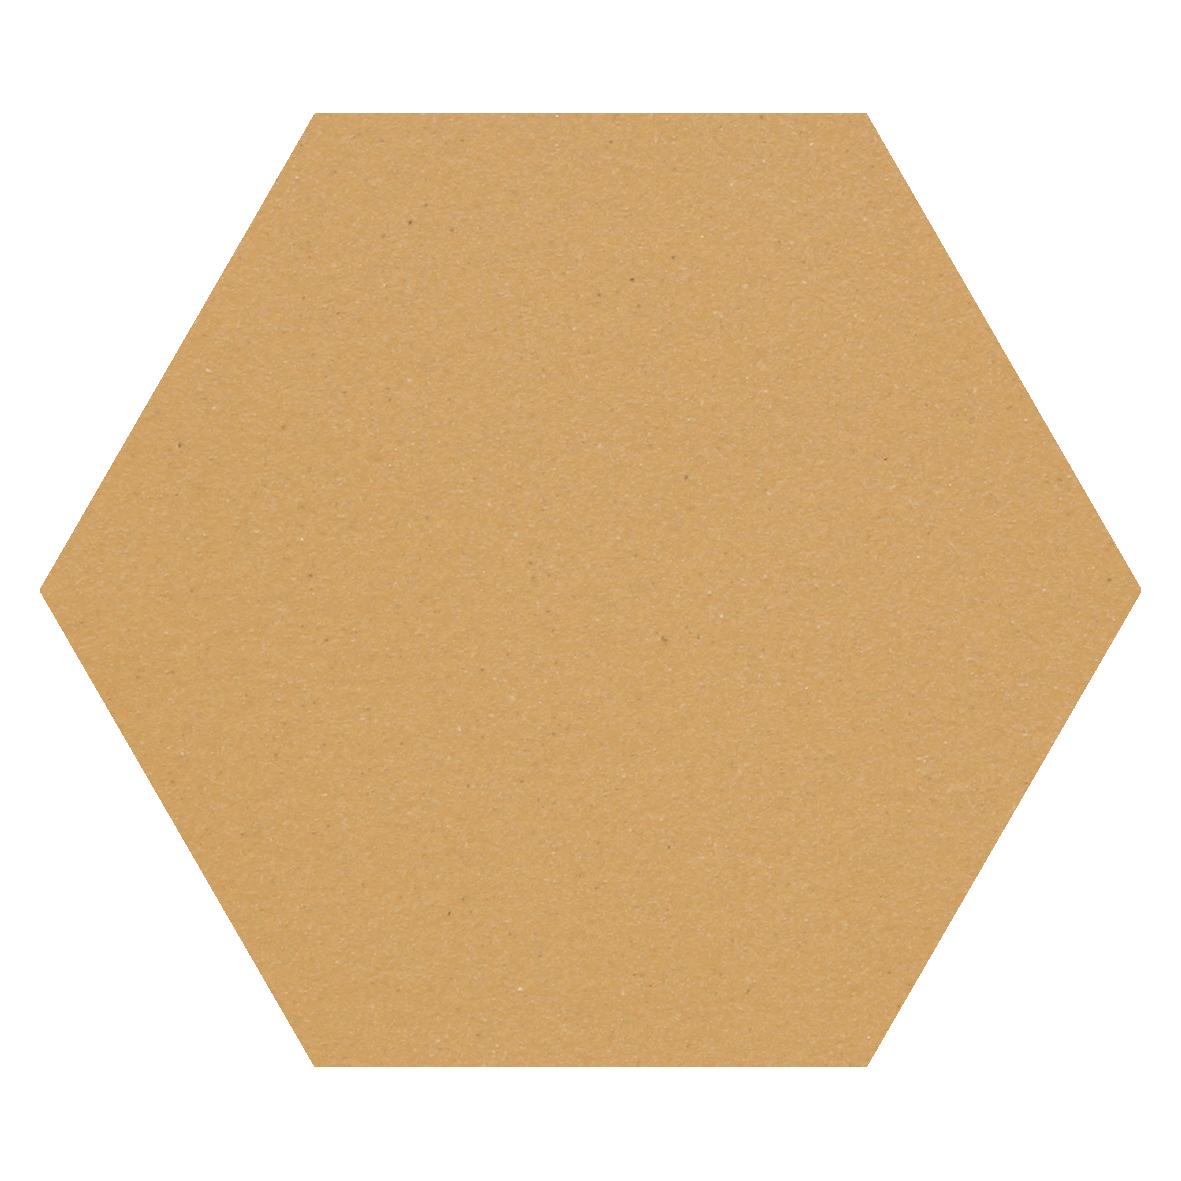 PNM360530, Natura, Oranssi, seina,lattia,pakkasenkesto,uimahalli,design_from_finland